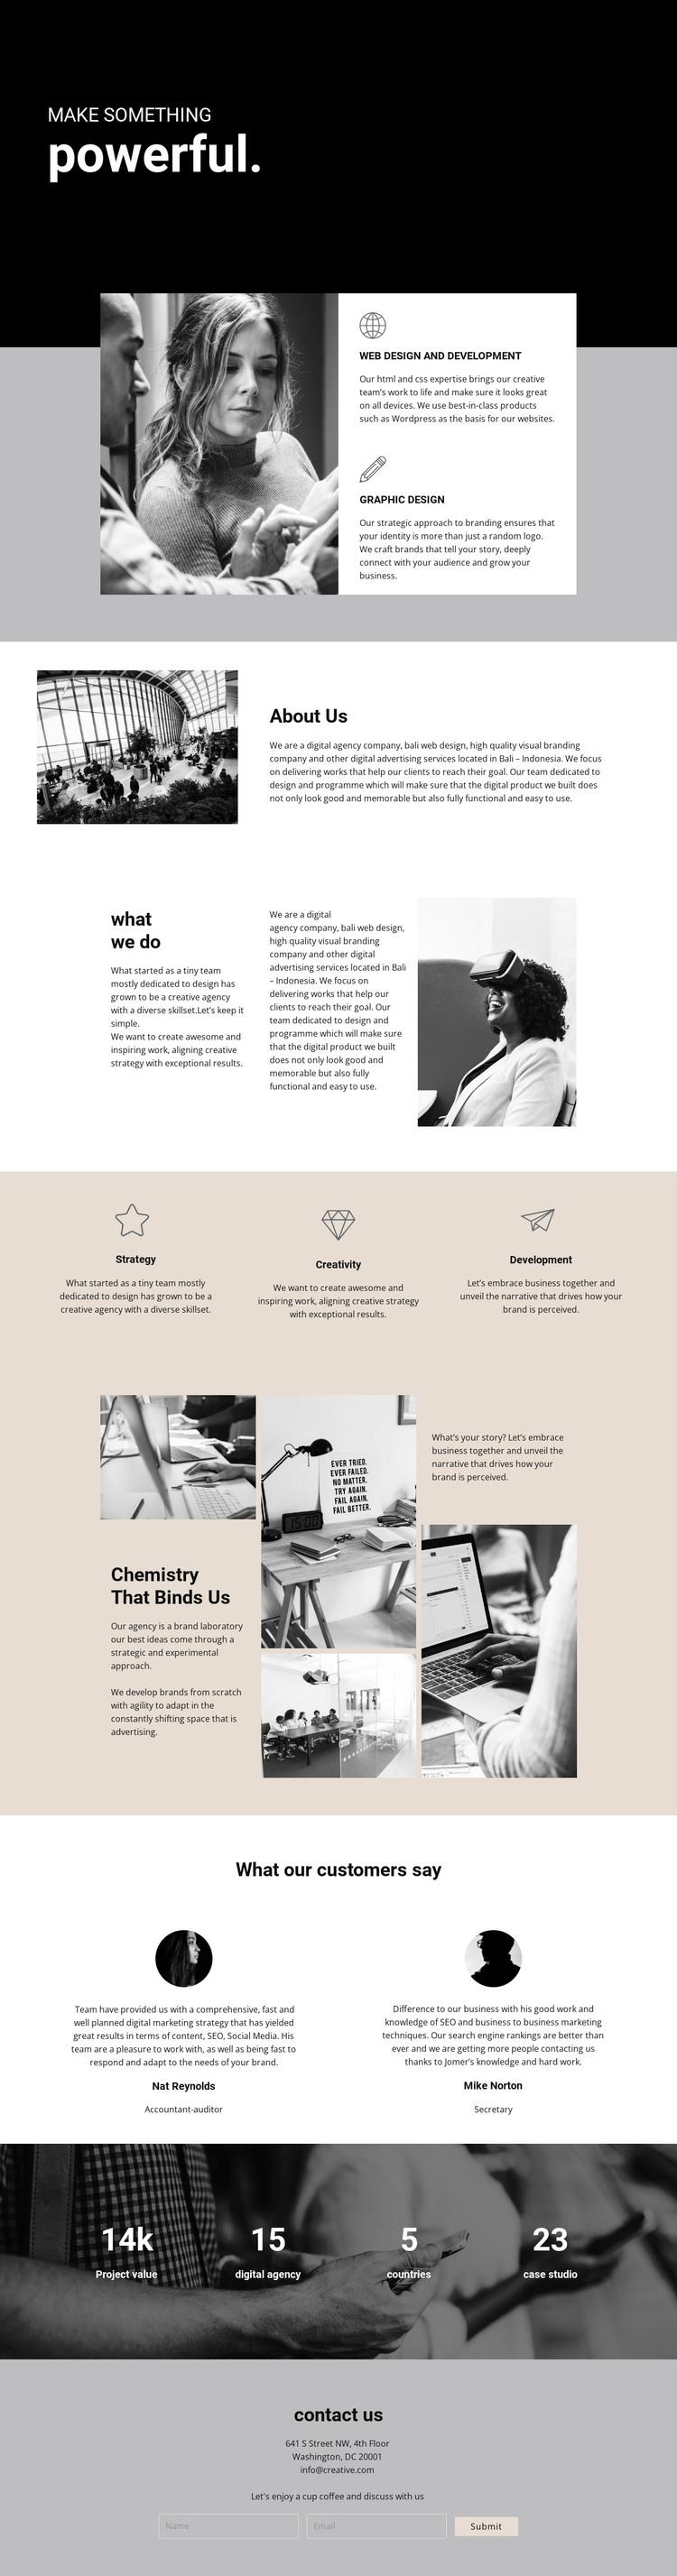 Power of digital business WordPress Theme